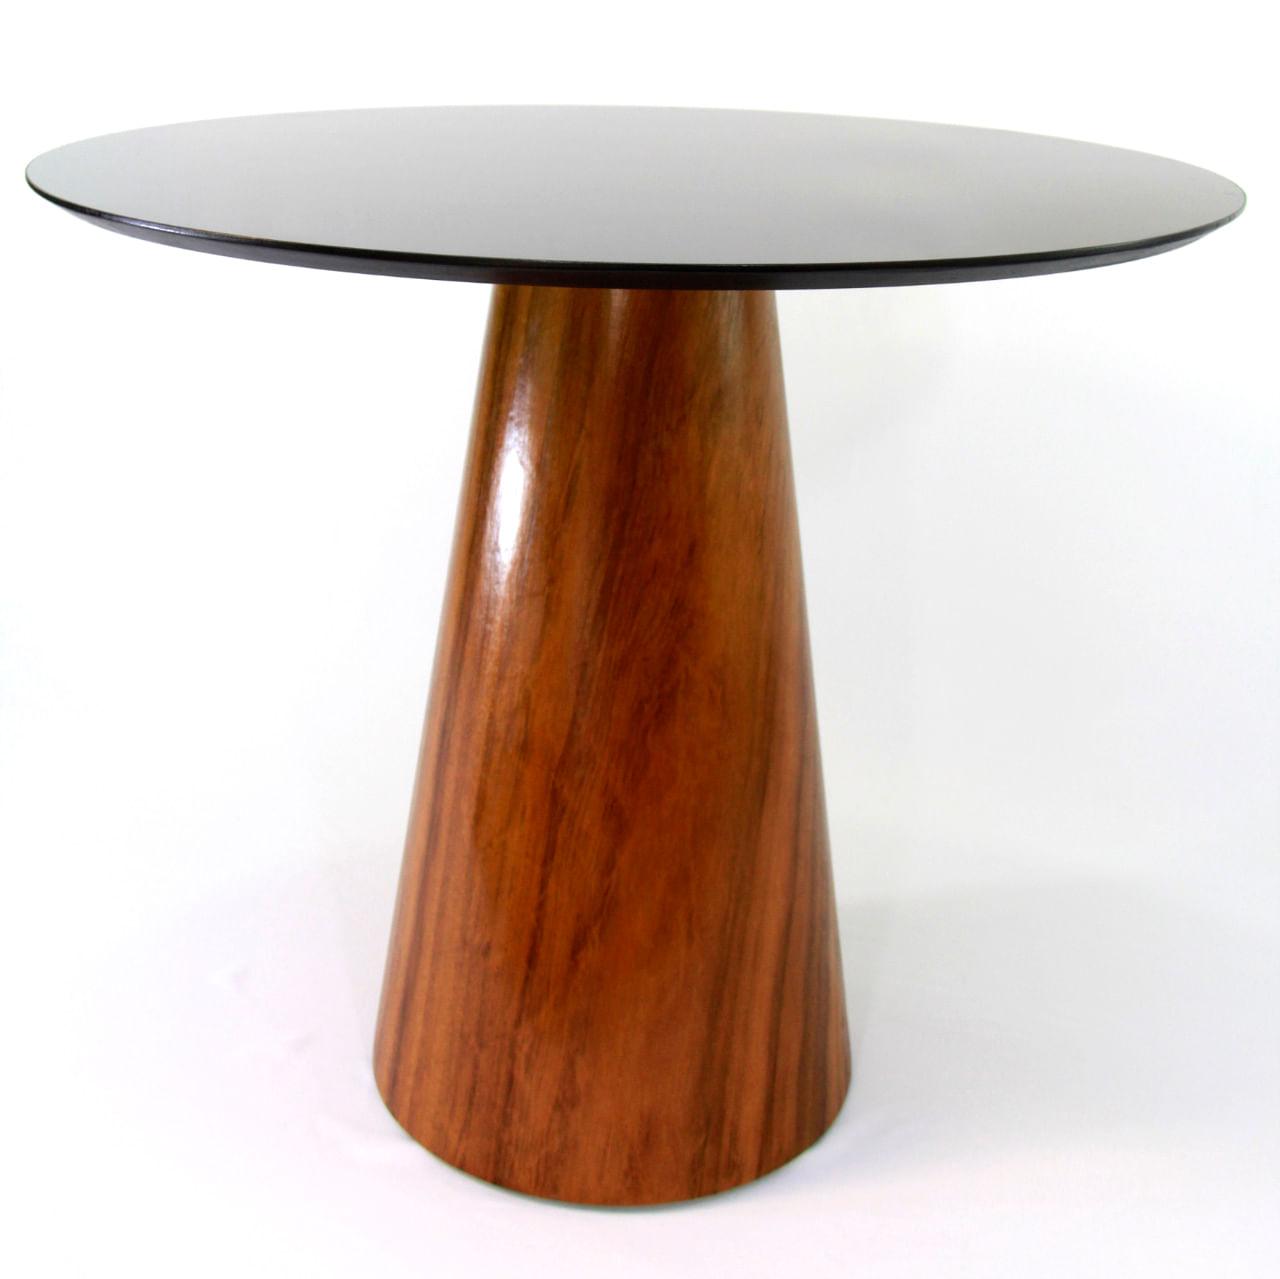 Mesa de Jantar Cone 90 cm Base Madeira Imbuia